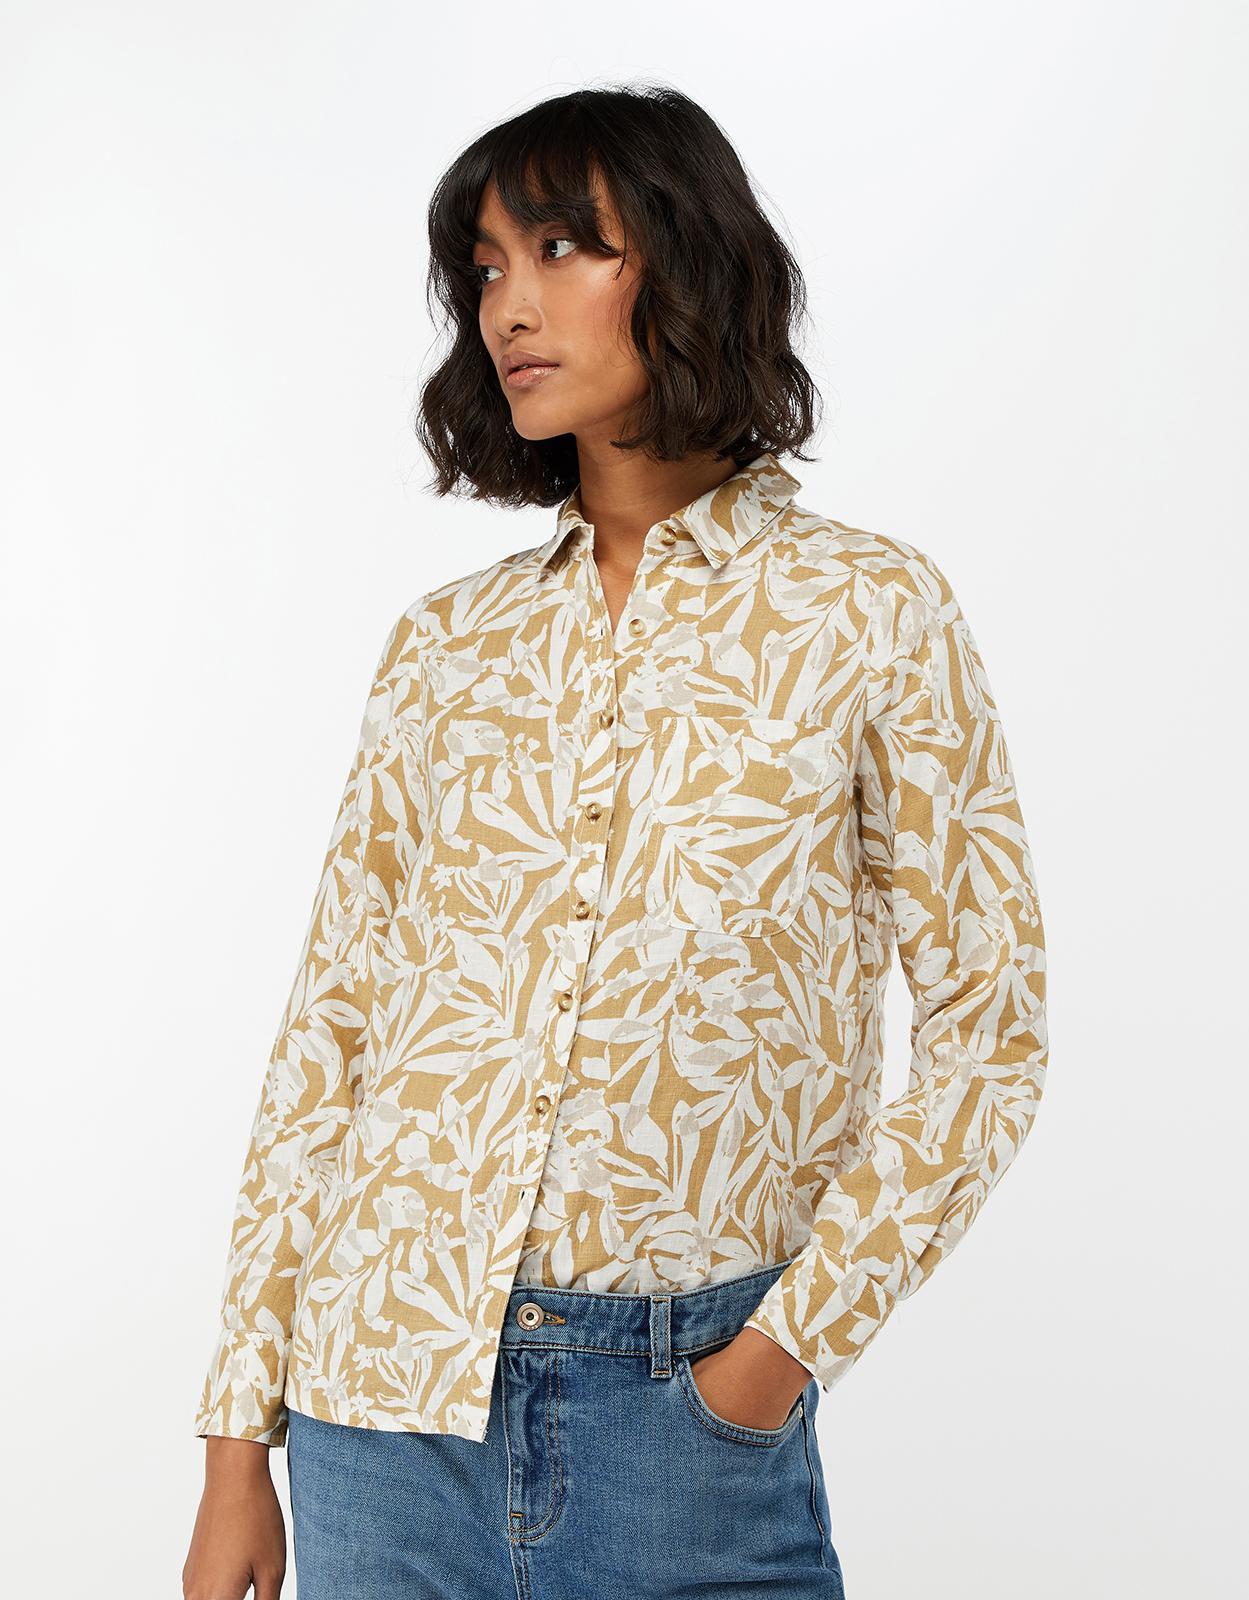 689859c7f42 Monsoon Courtney Print Linen Shirt in Natural - Lyst